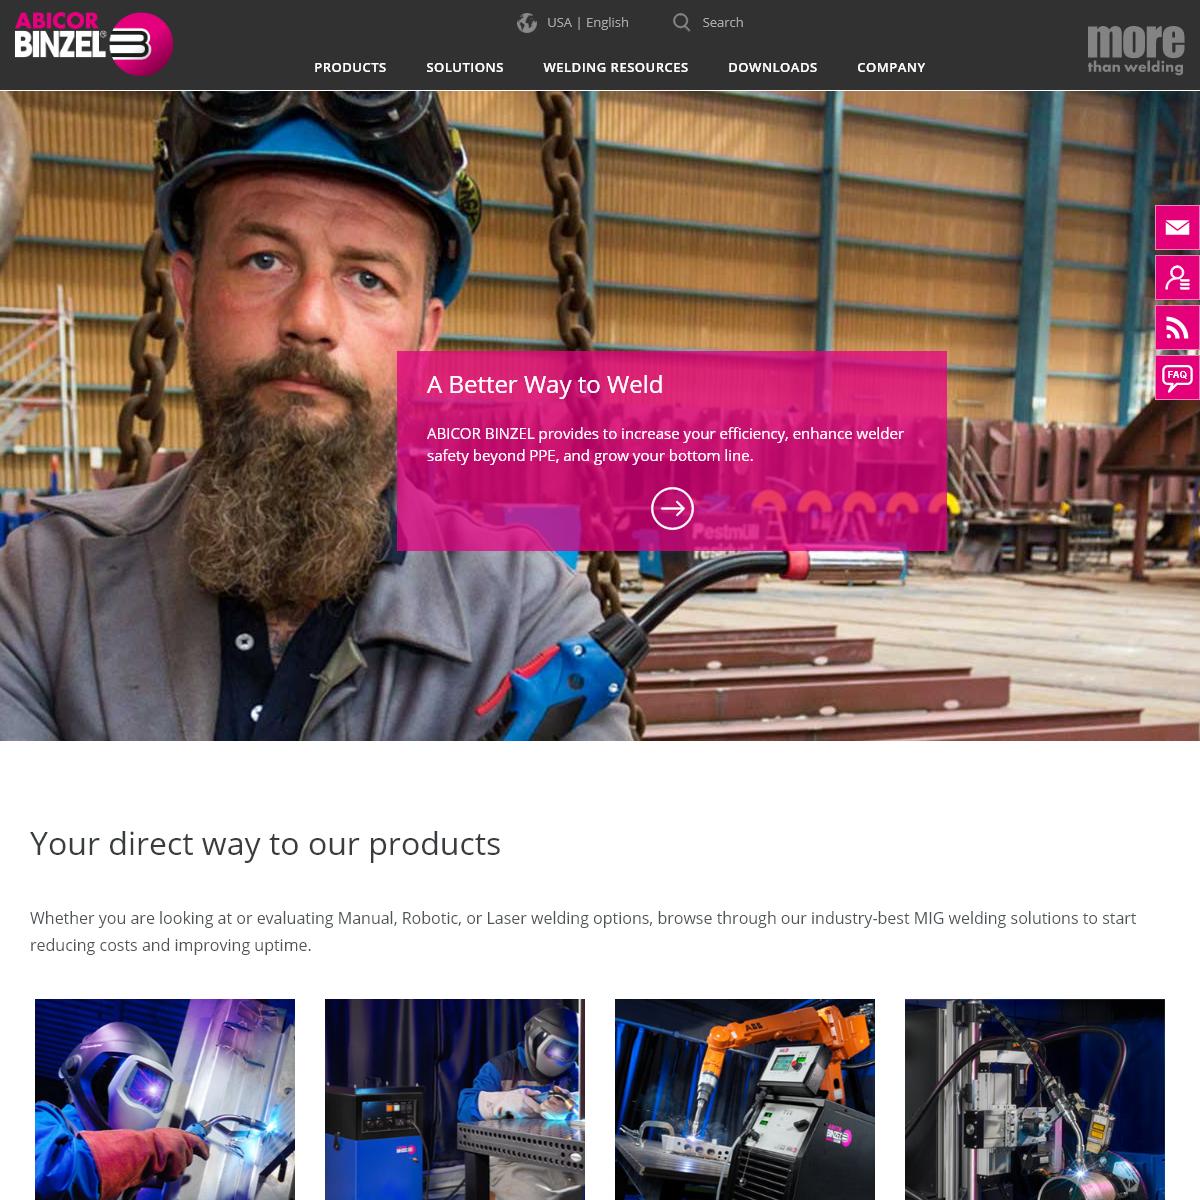 ABICOR BINZEL USA - MIG, Robotic, & Laser Welding Solutions